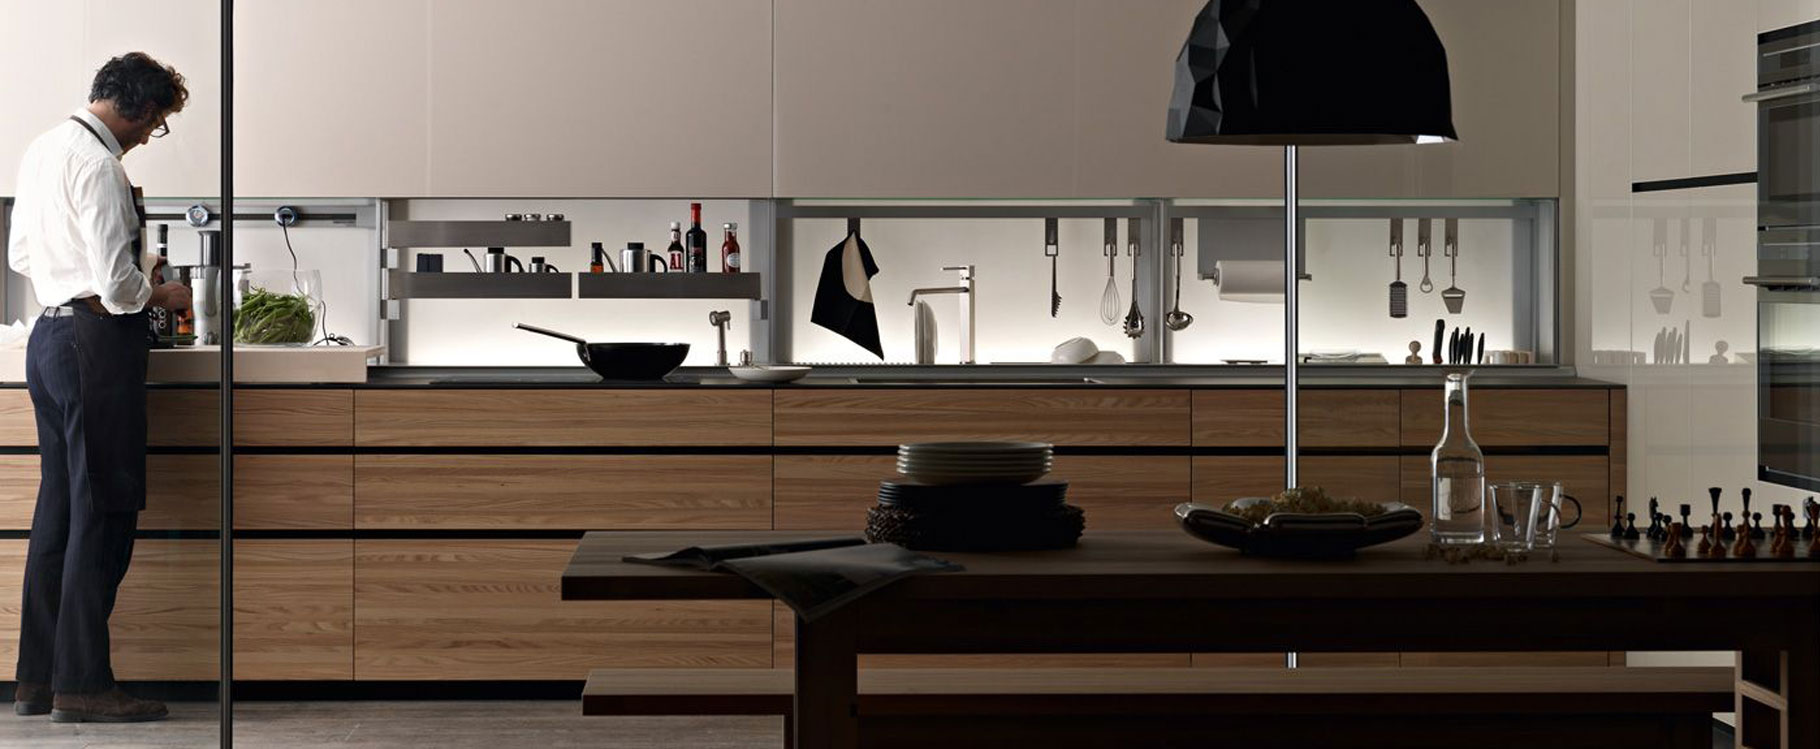 Cucine monza prezzi outlet cucine monza vendita cucine for Cucine outlet